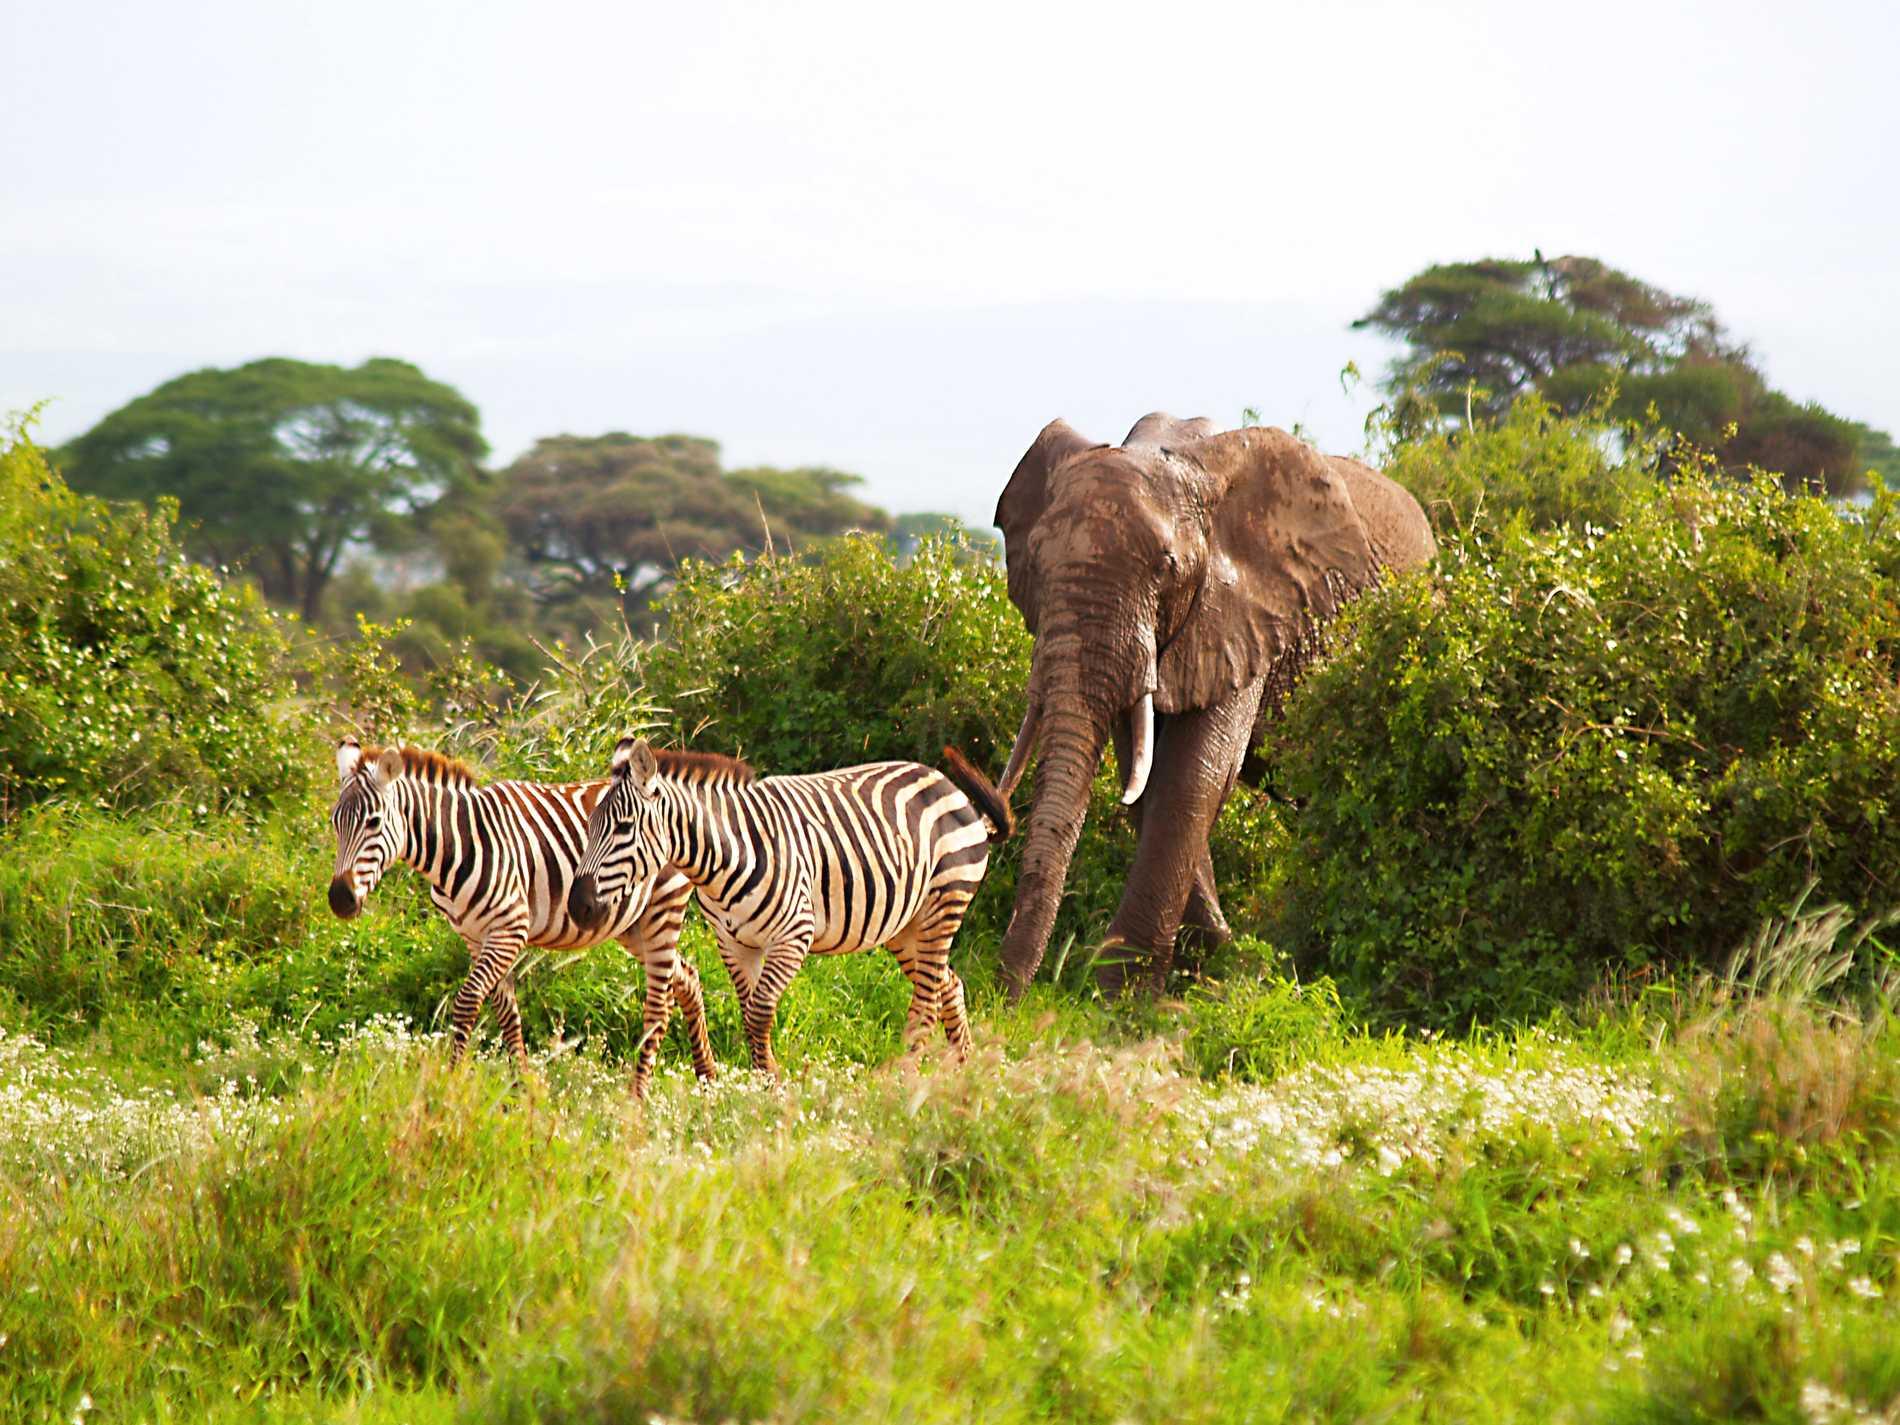 Safarin i Kenya var riktigt häftig, berättar Ann-Christine.